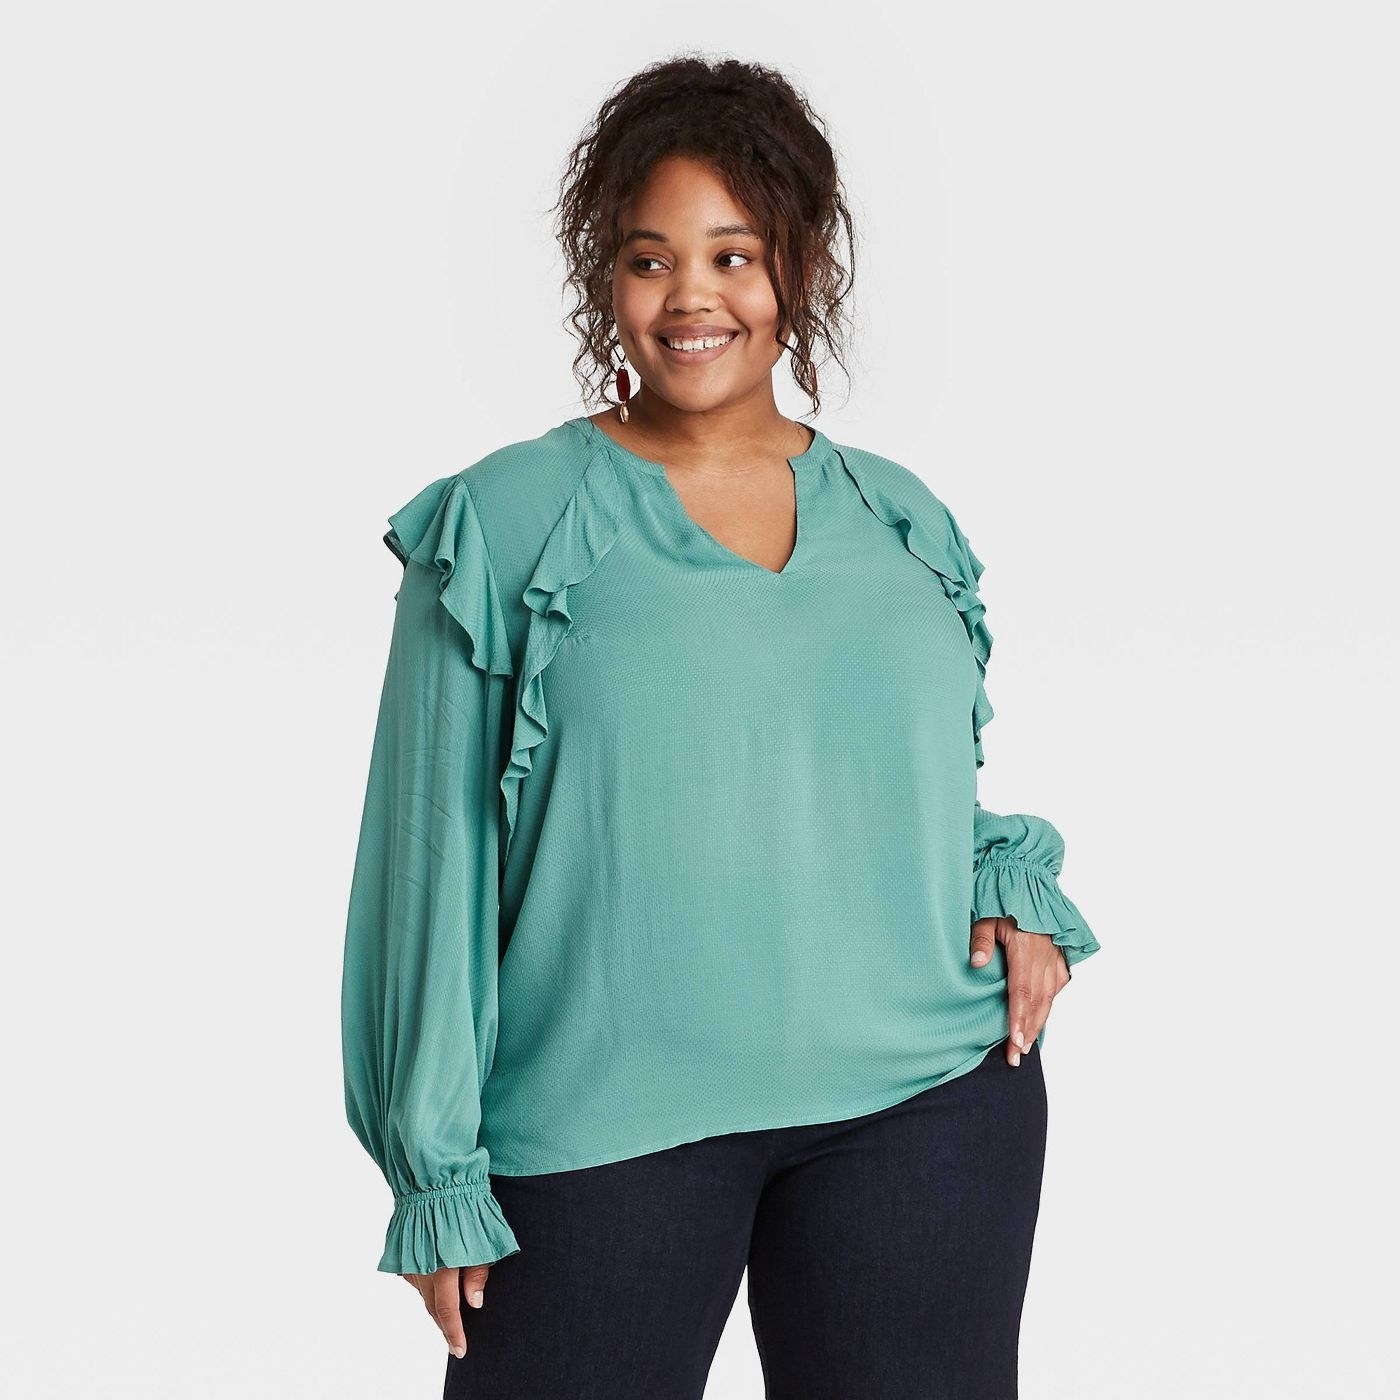 Model wearing teal blouse